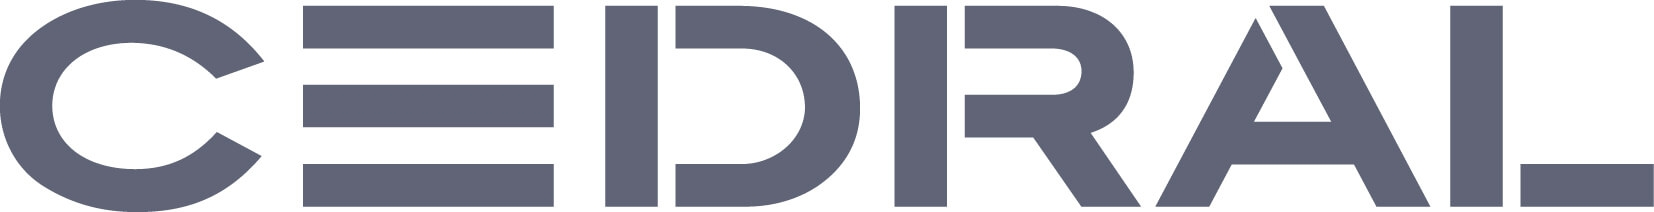 Logo Cedral